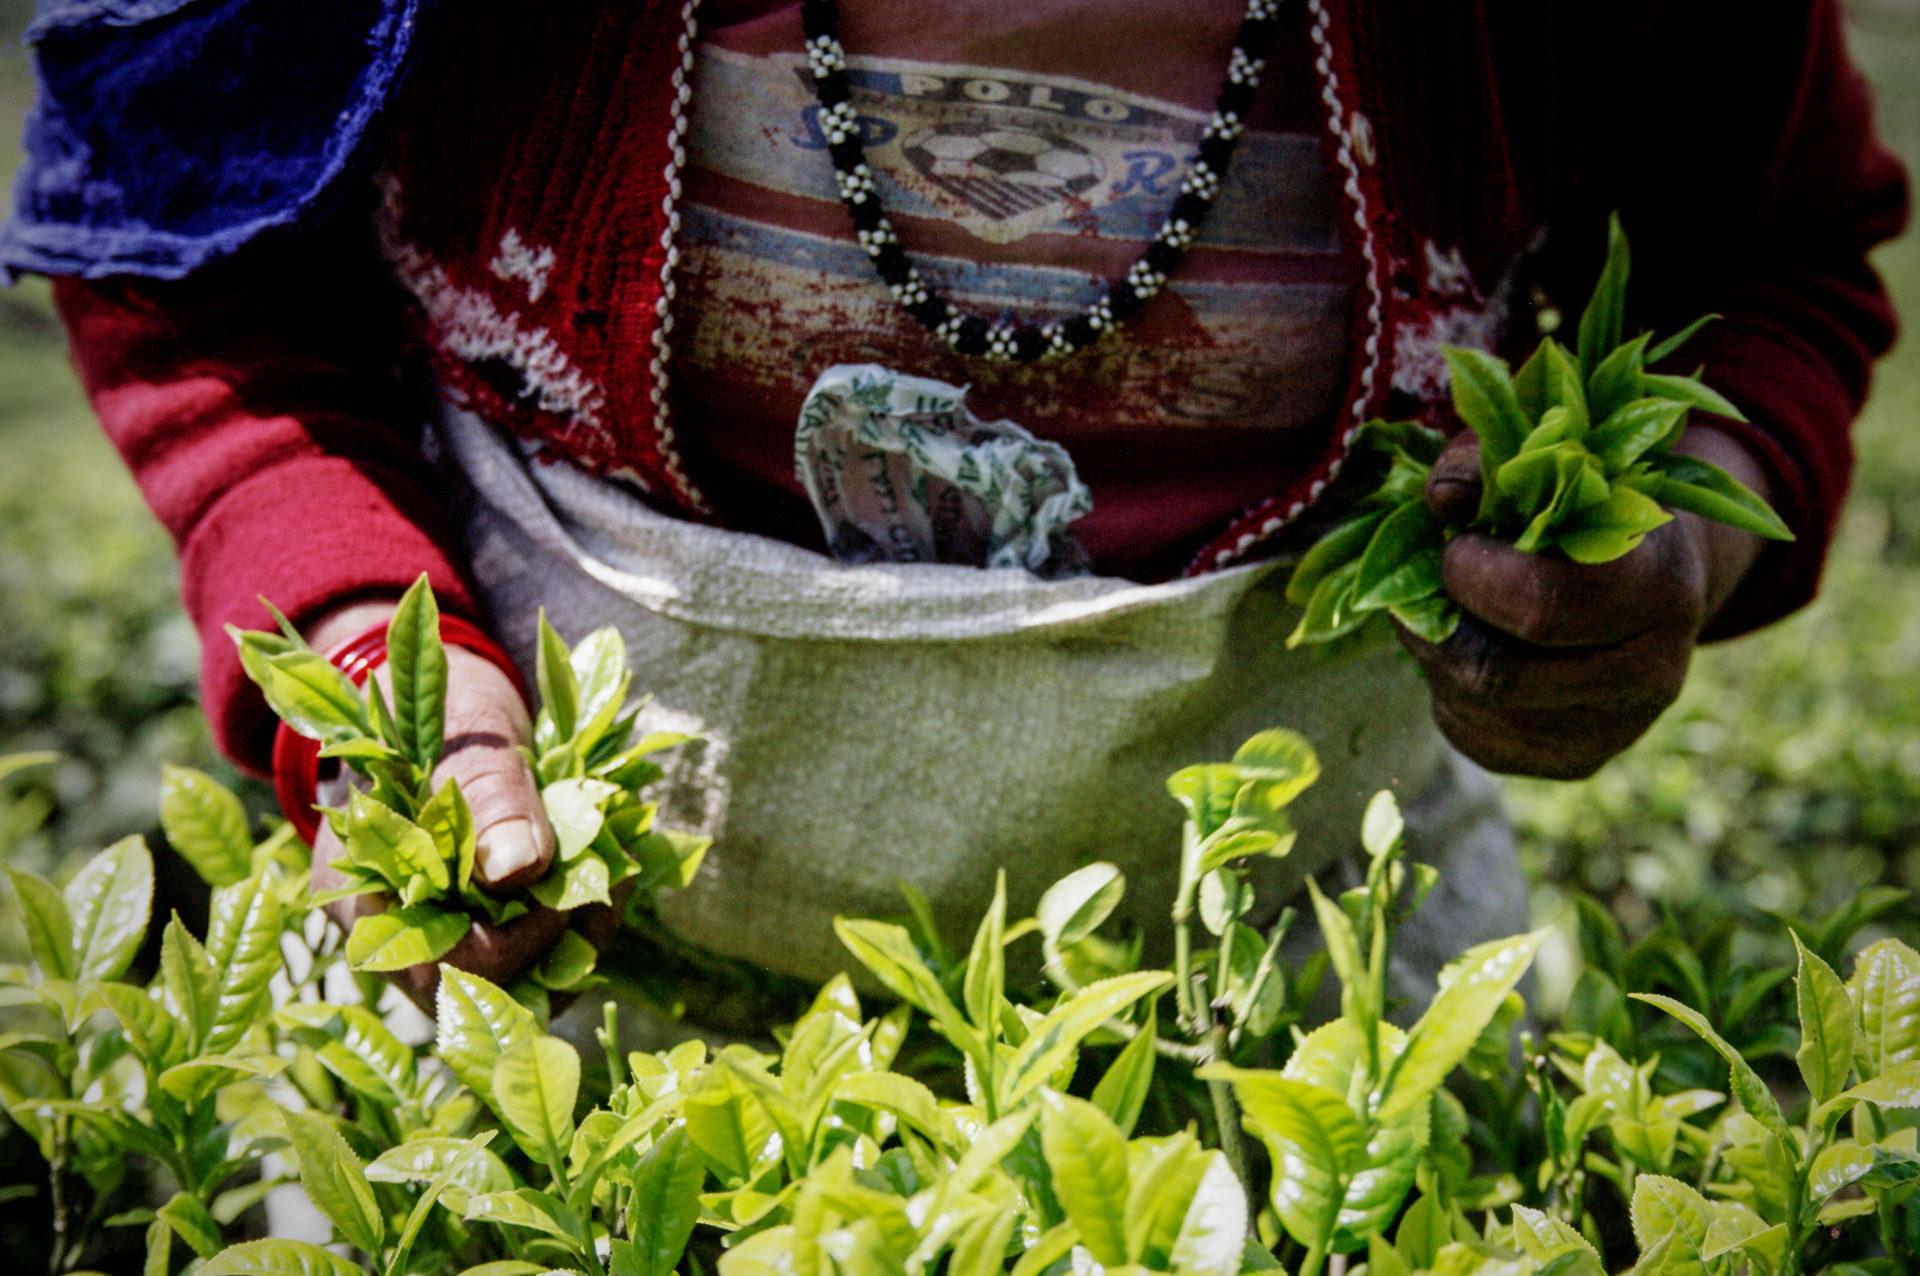 GIZ_Nepal_Organic-Tea_Ilam_IGP6659_Carolin-Weinkopf